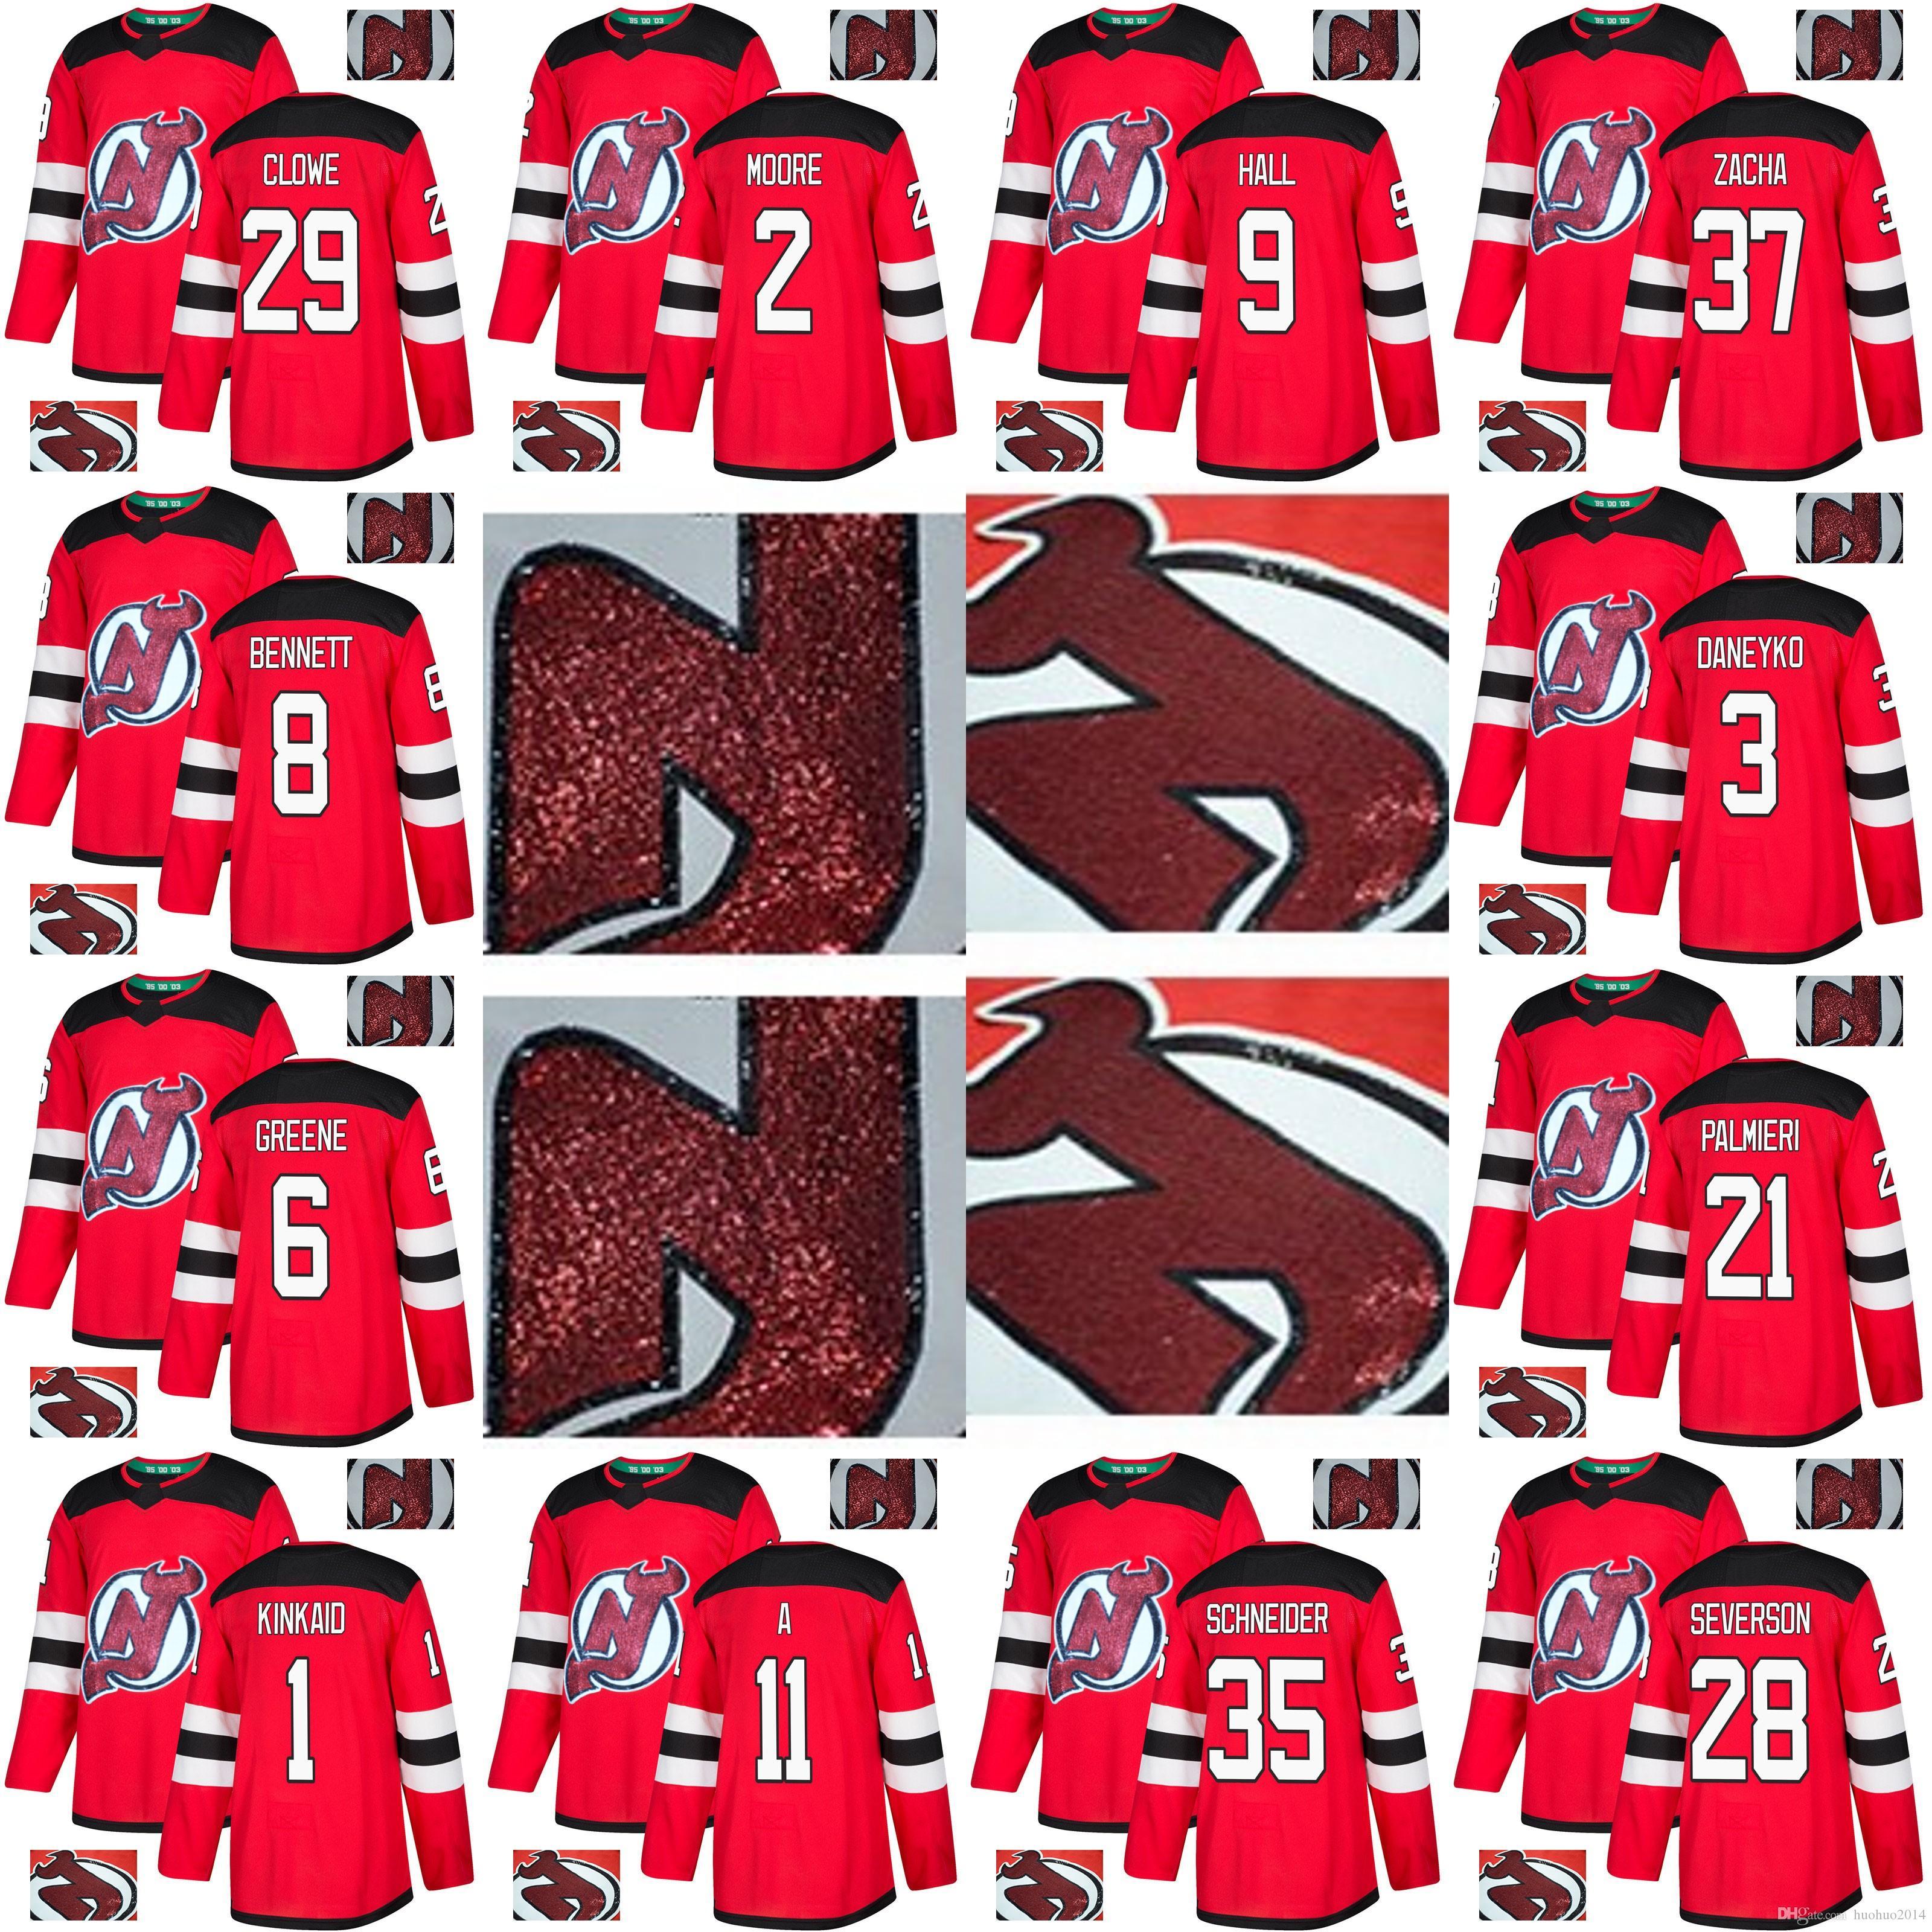 e1dc3a73bf4 2019 New Jersey Devils Gold Embroidery Jerseys Taylor Hall Kyle Palmieri  Keith Kinkaid Cory Schneider Pavel Zacha Cory Schneider Hockey Jerseys From  ...